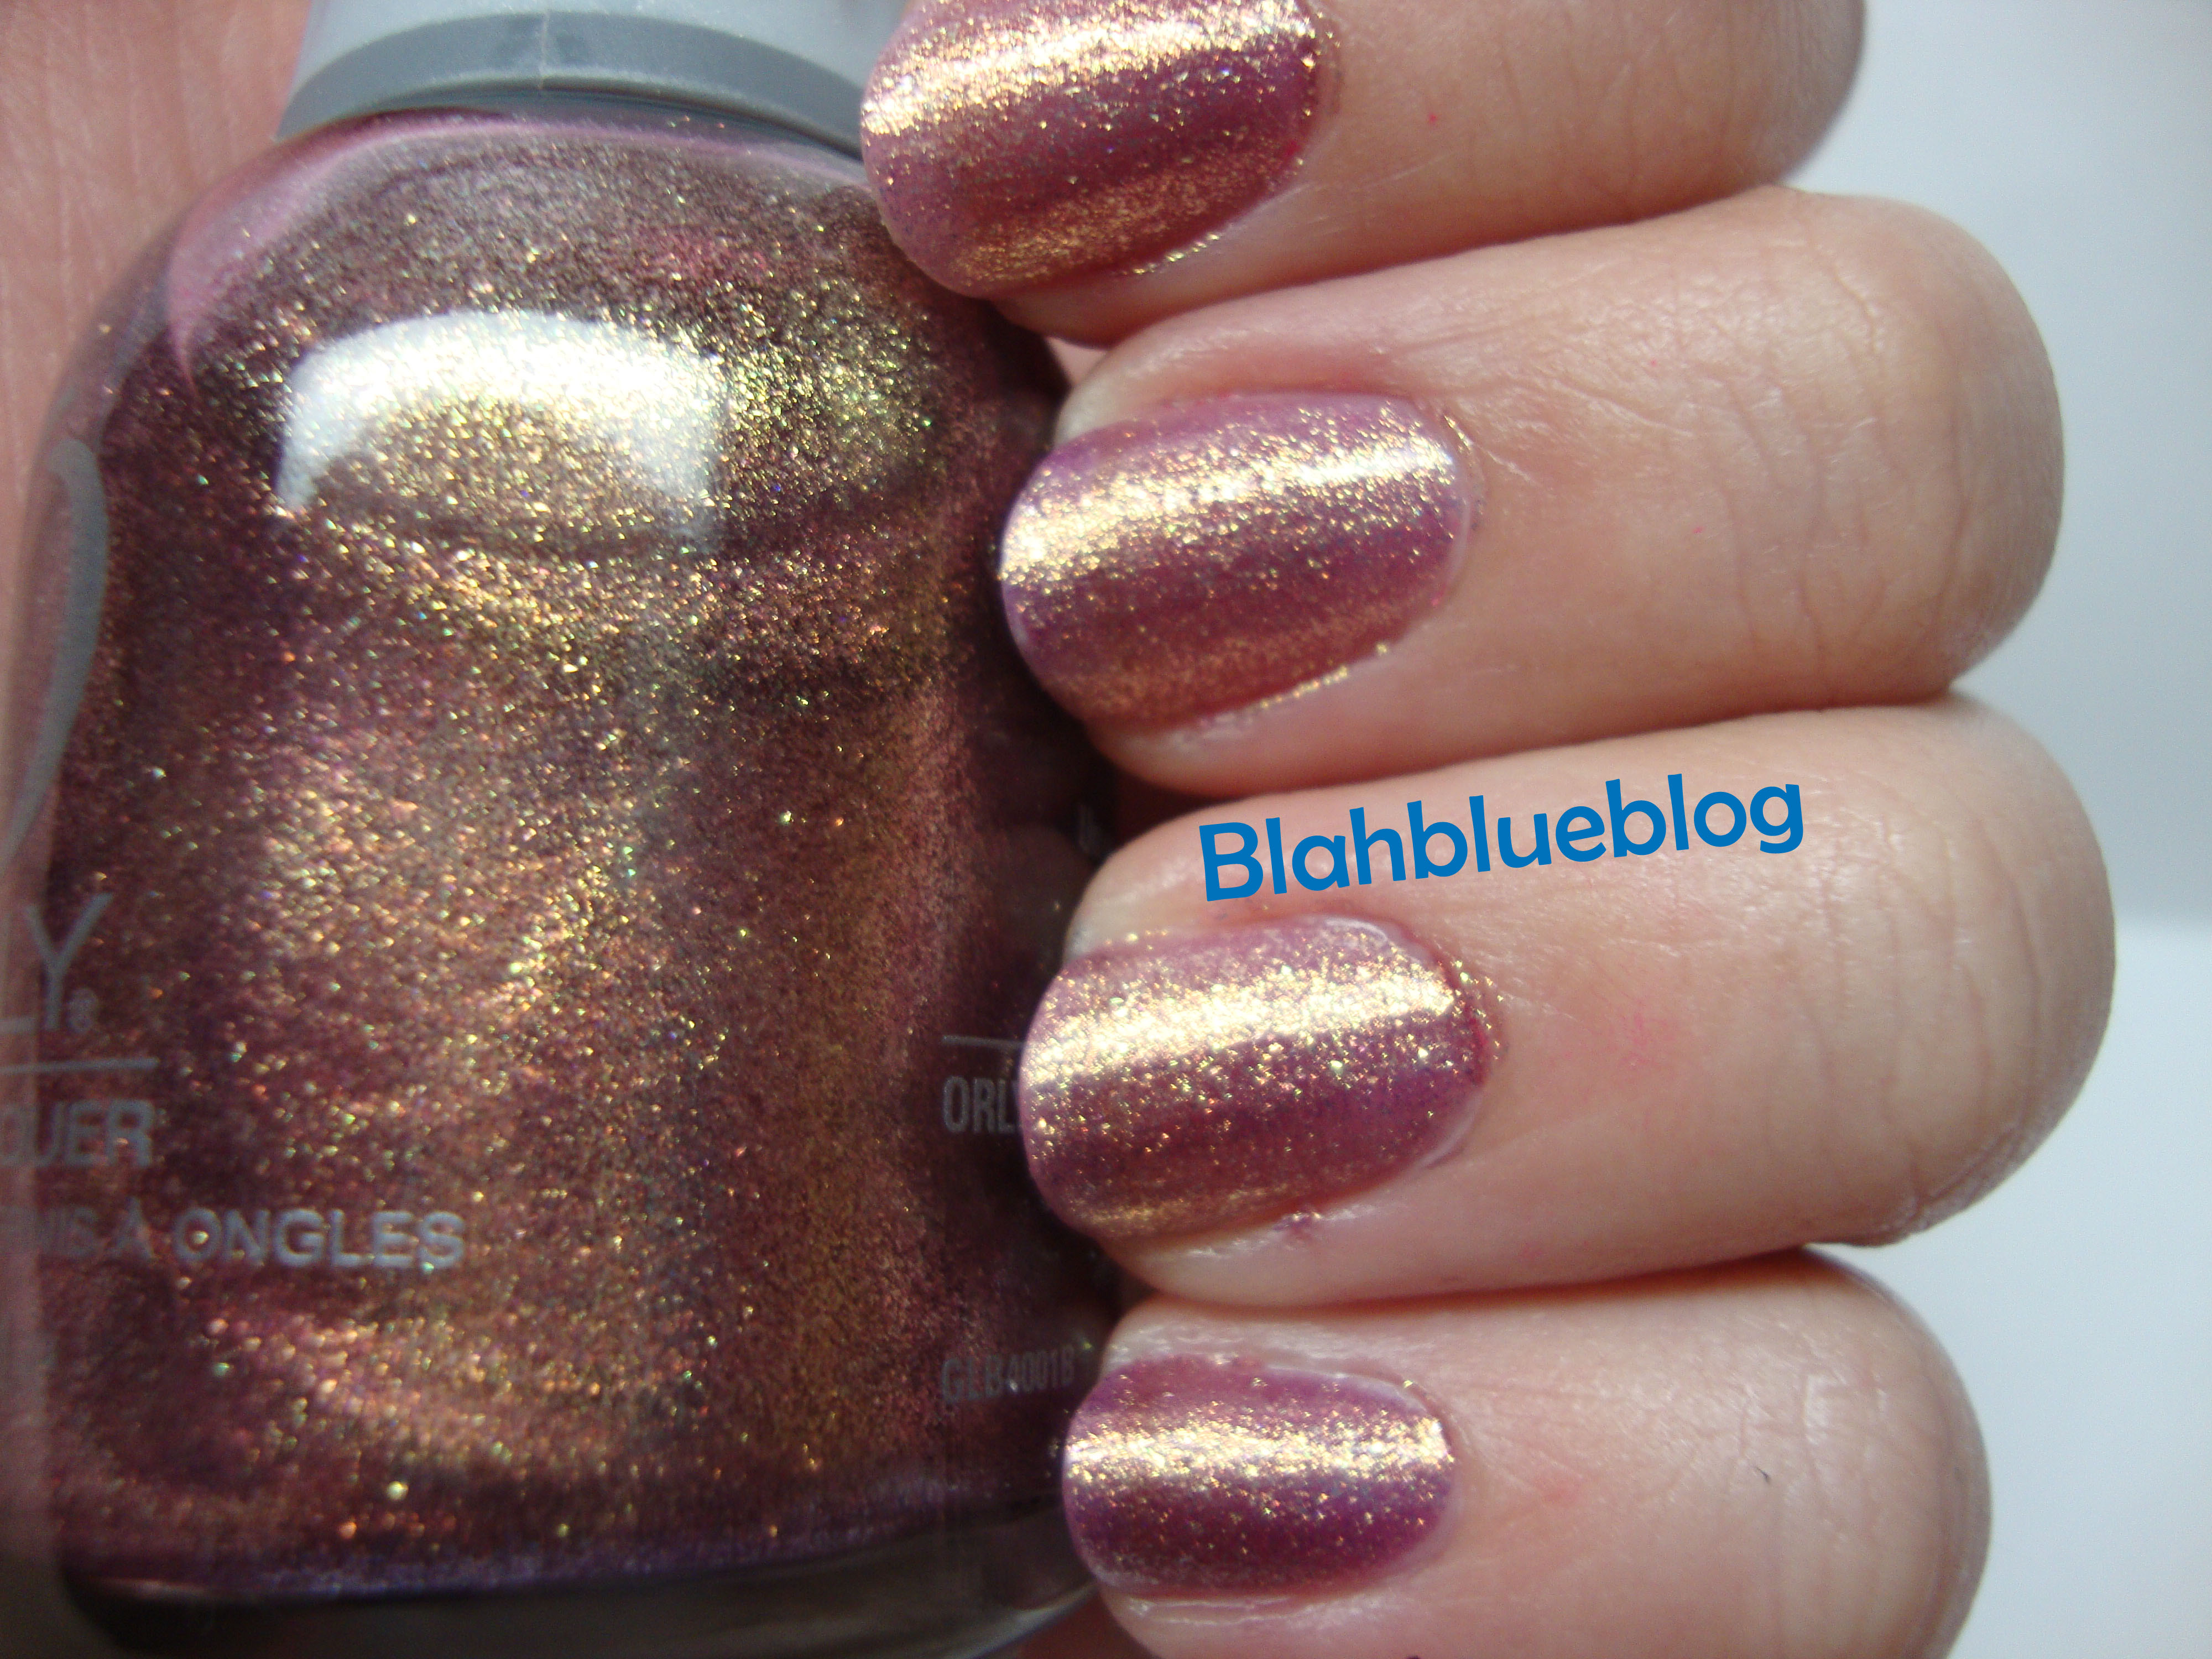 Orly nail polish | blahblueblog